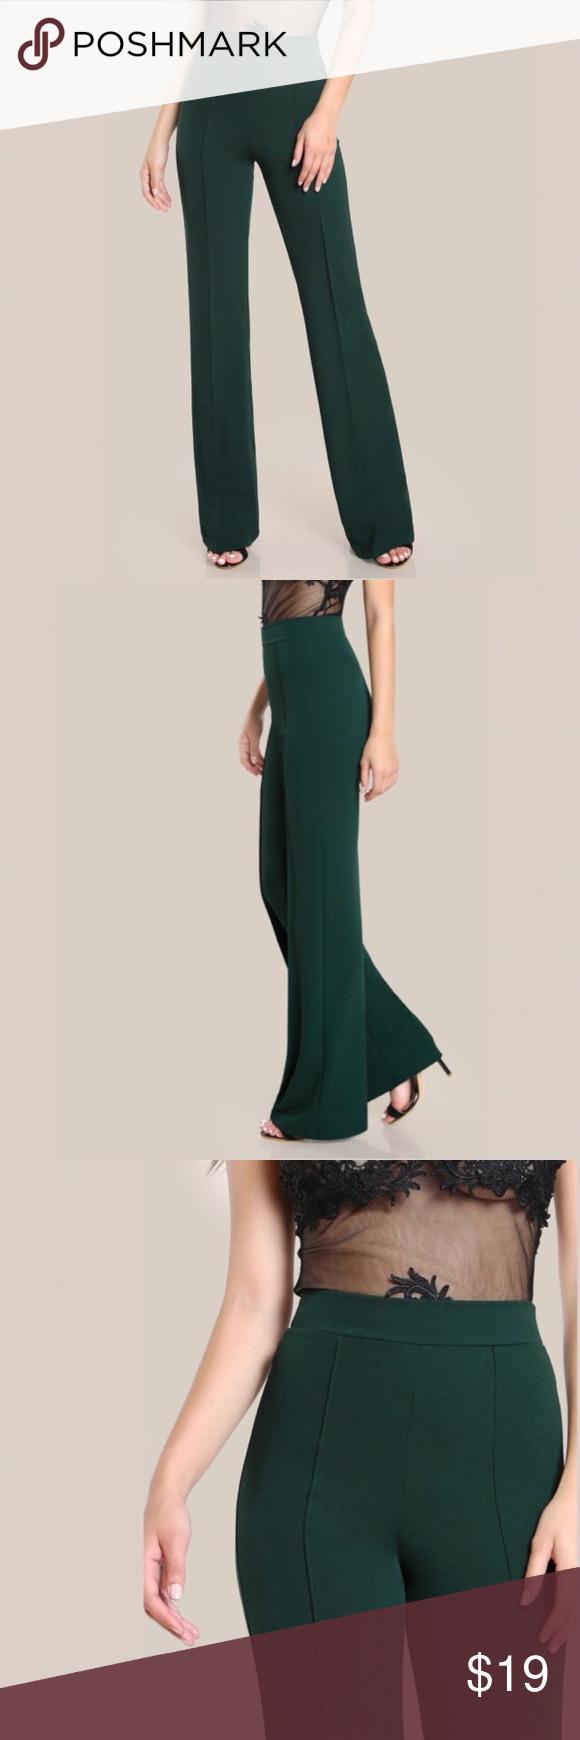 Green dress night out  High Piped Dress Pants in Dark Green NWT  My Posh Picks  Pinterest